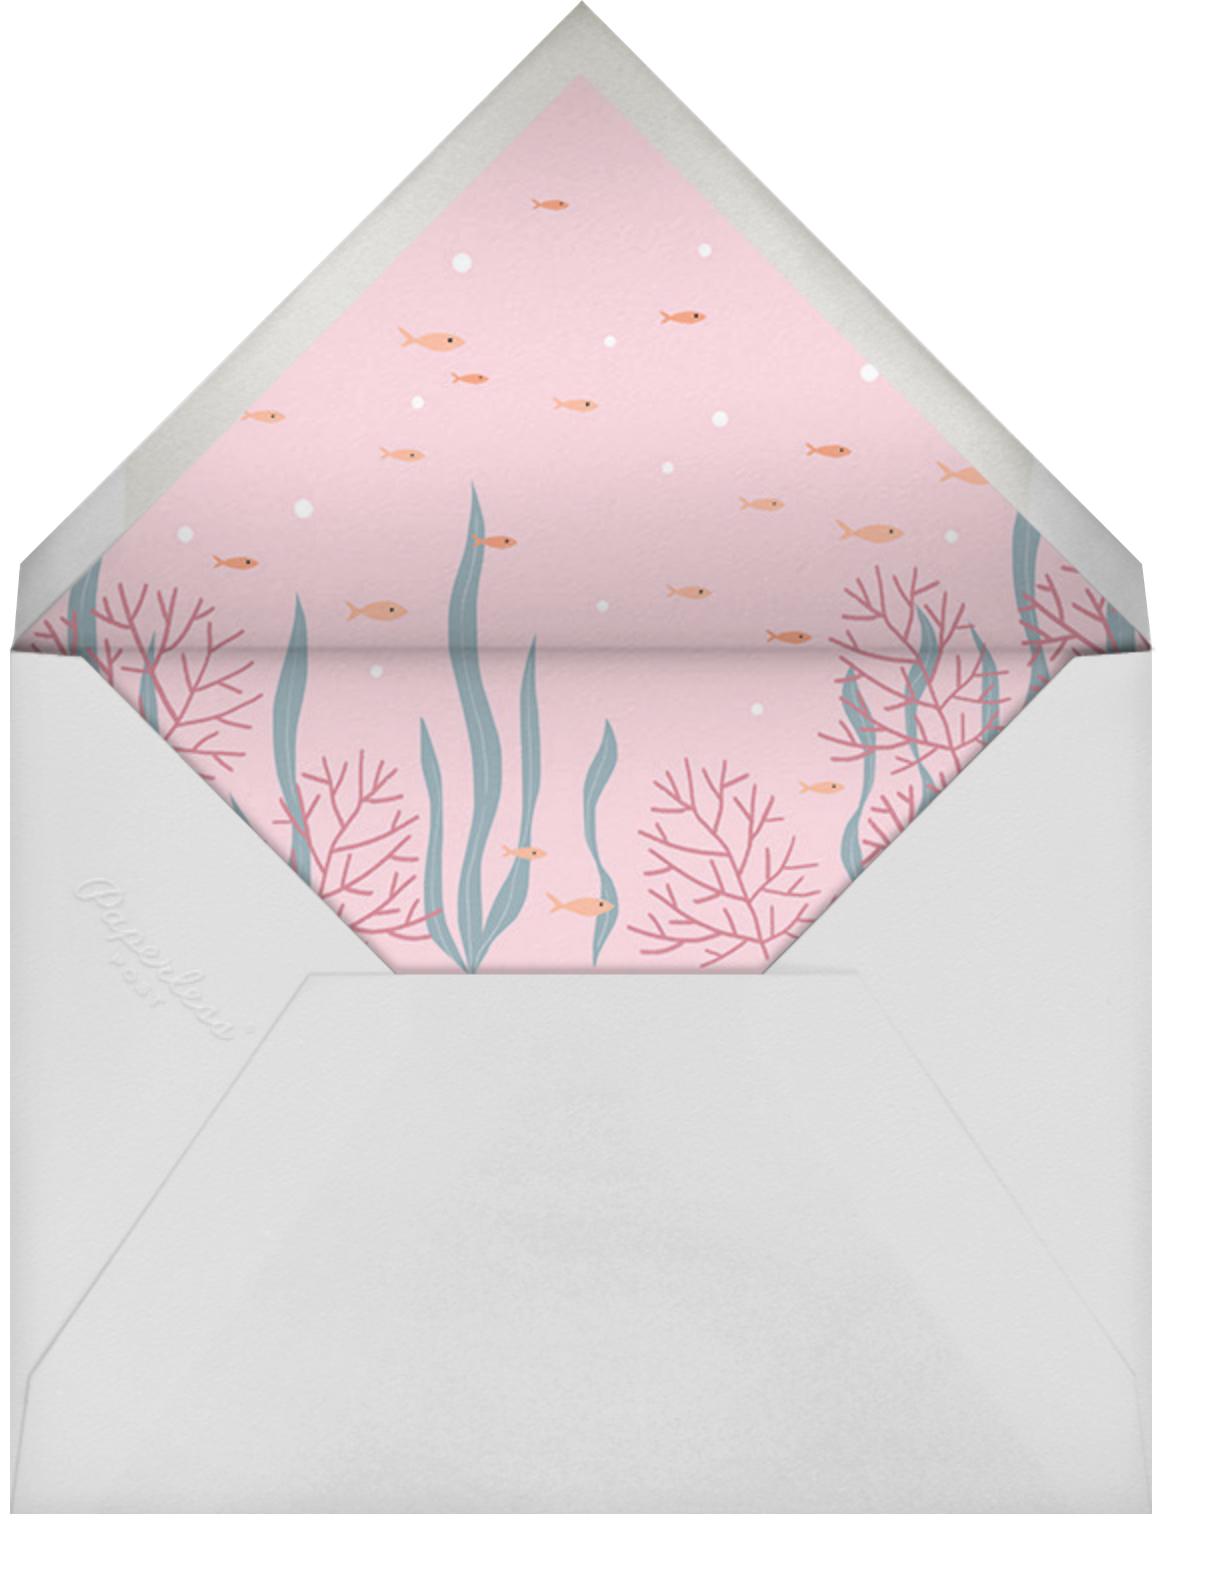 Mermaid Cove - Sherbet - Paperless Post - Mermaid birthday invitations - envelope back